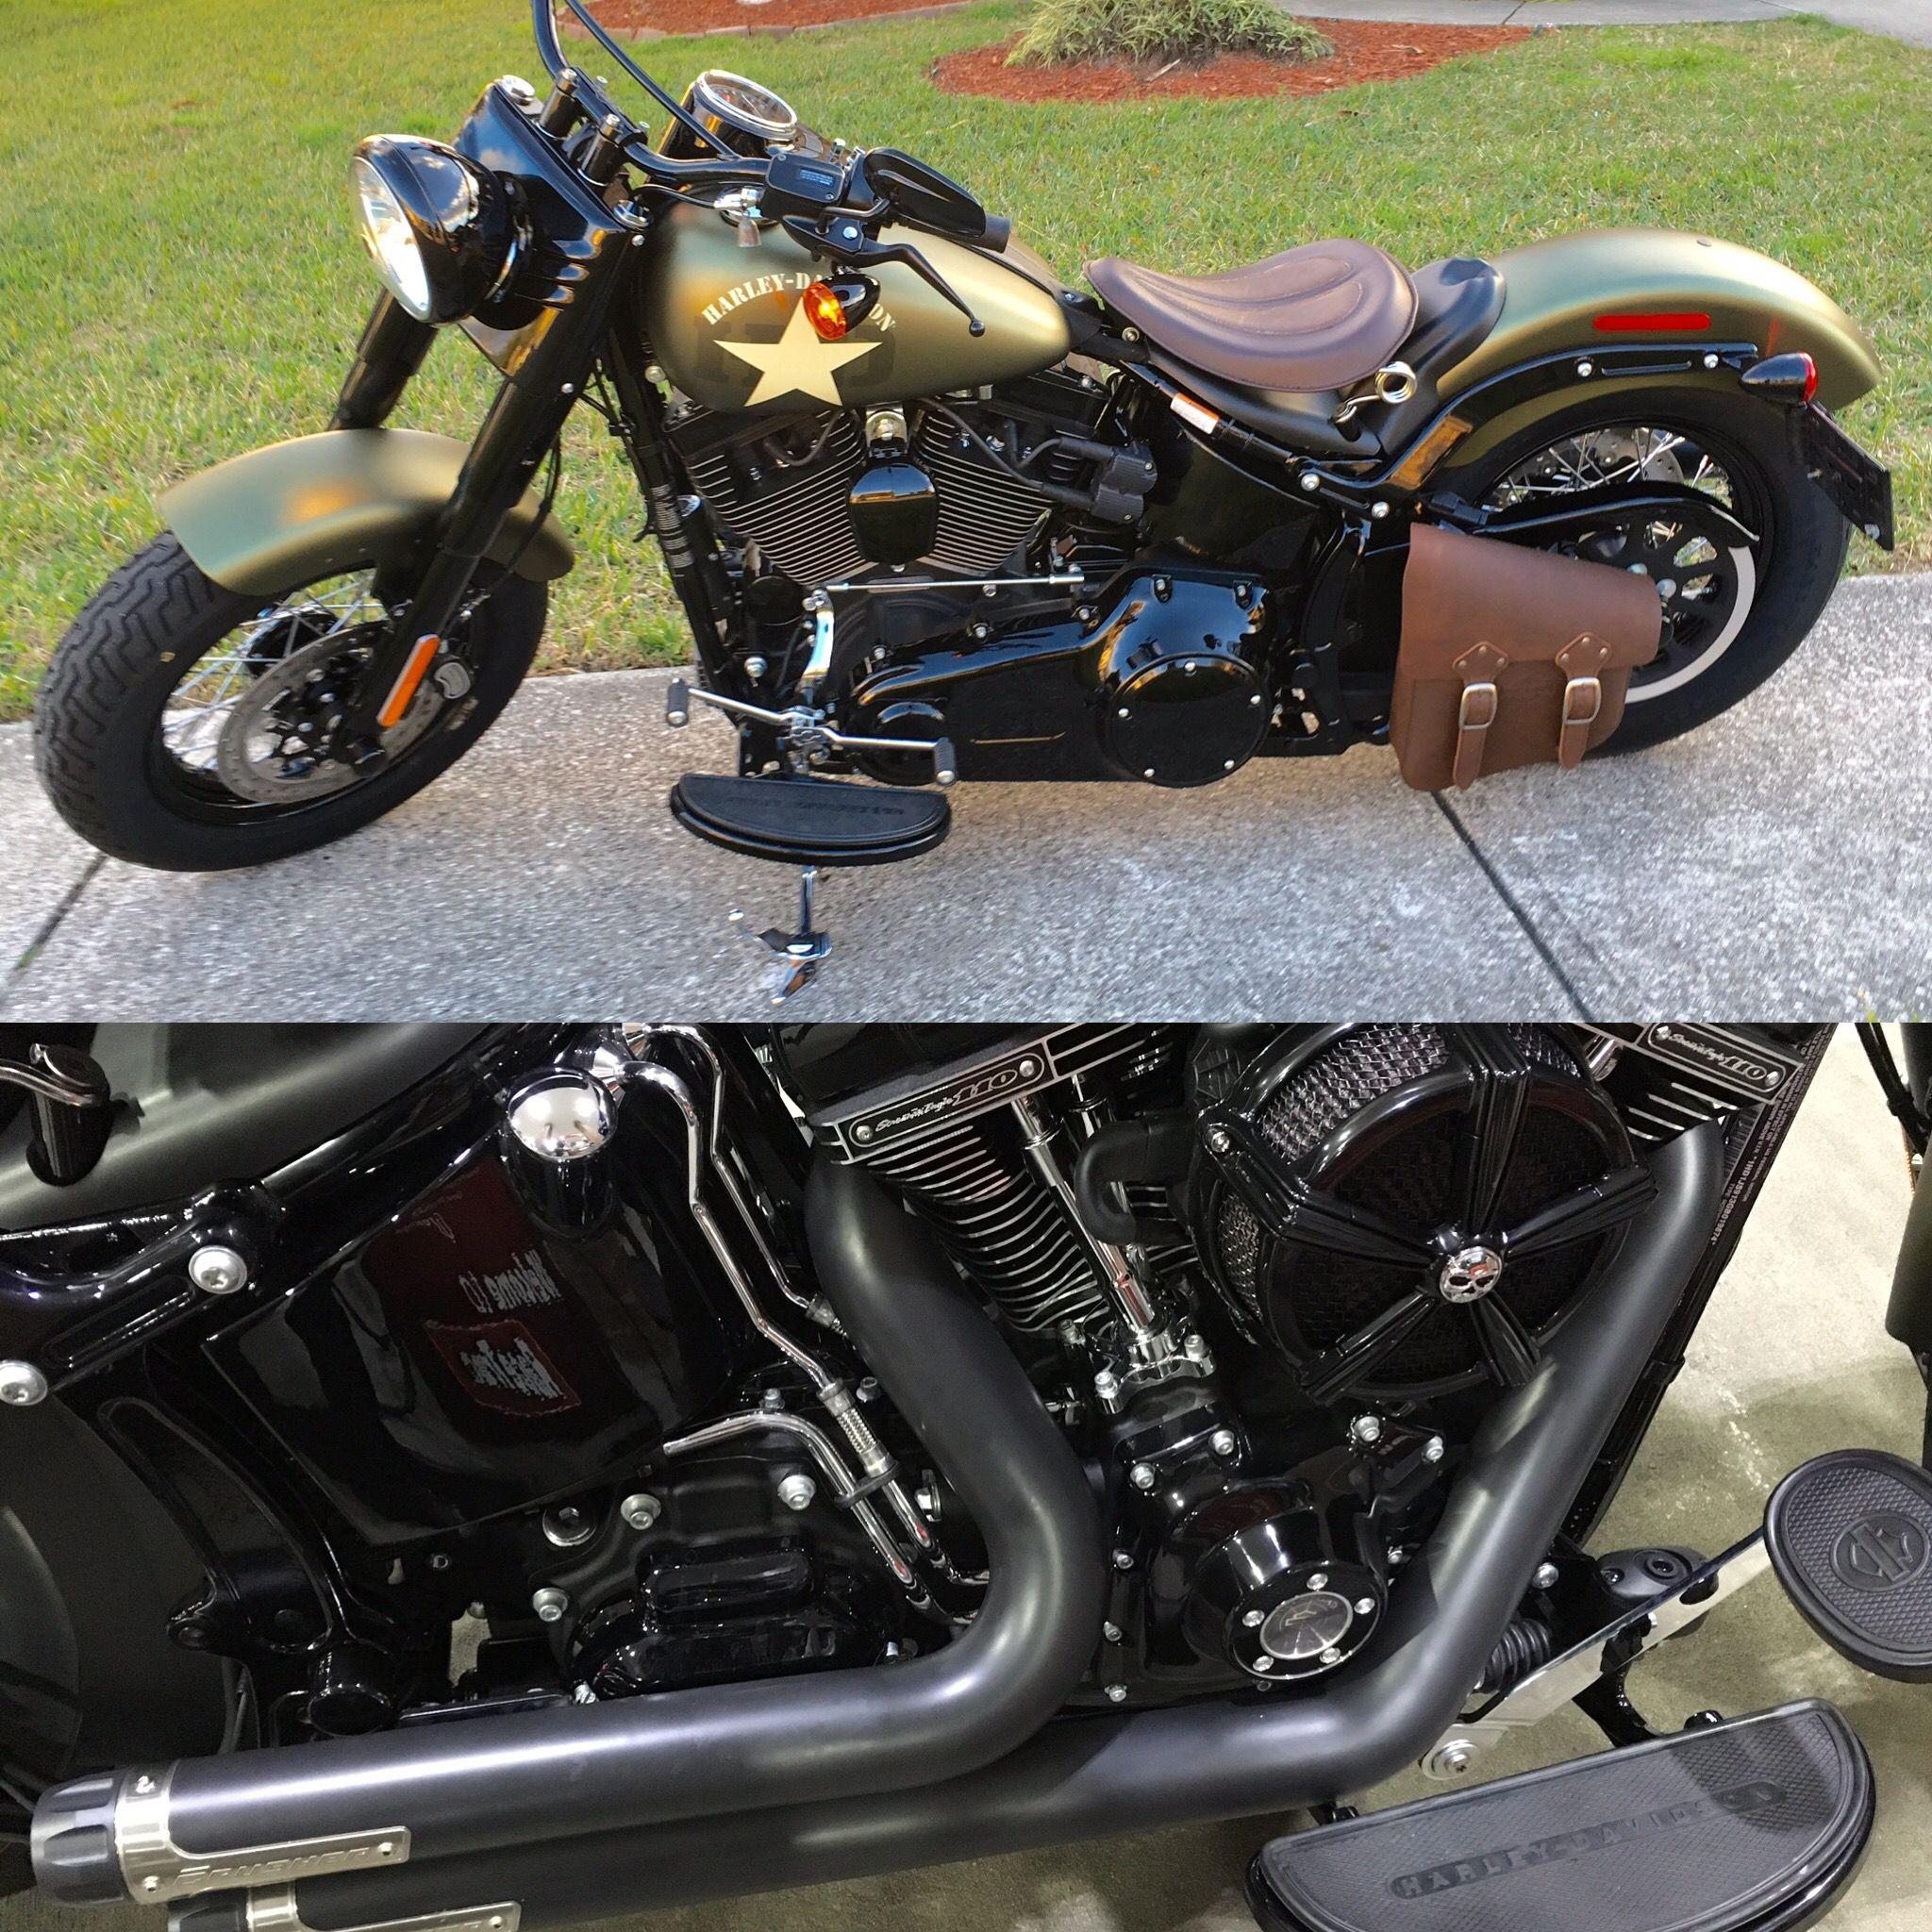 2016 Harley-Davidson FLSS Softail Slim S Custom 110 Screaming Eagle with Crusher Performance Maverick 2 exhaust & Mach 2 air cleaner.